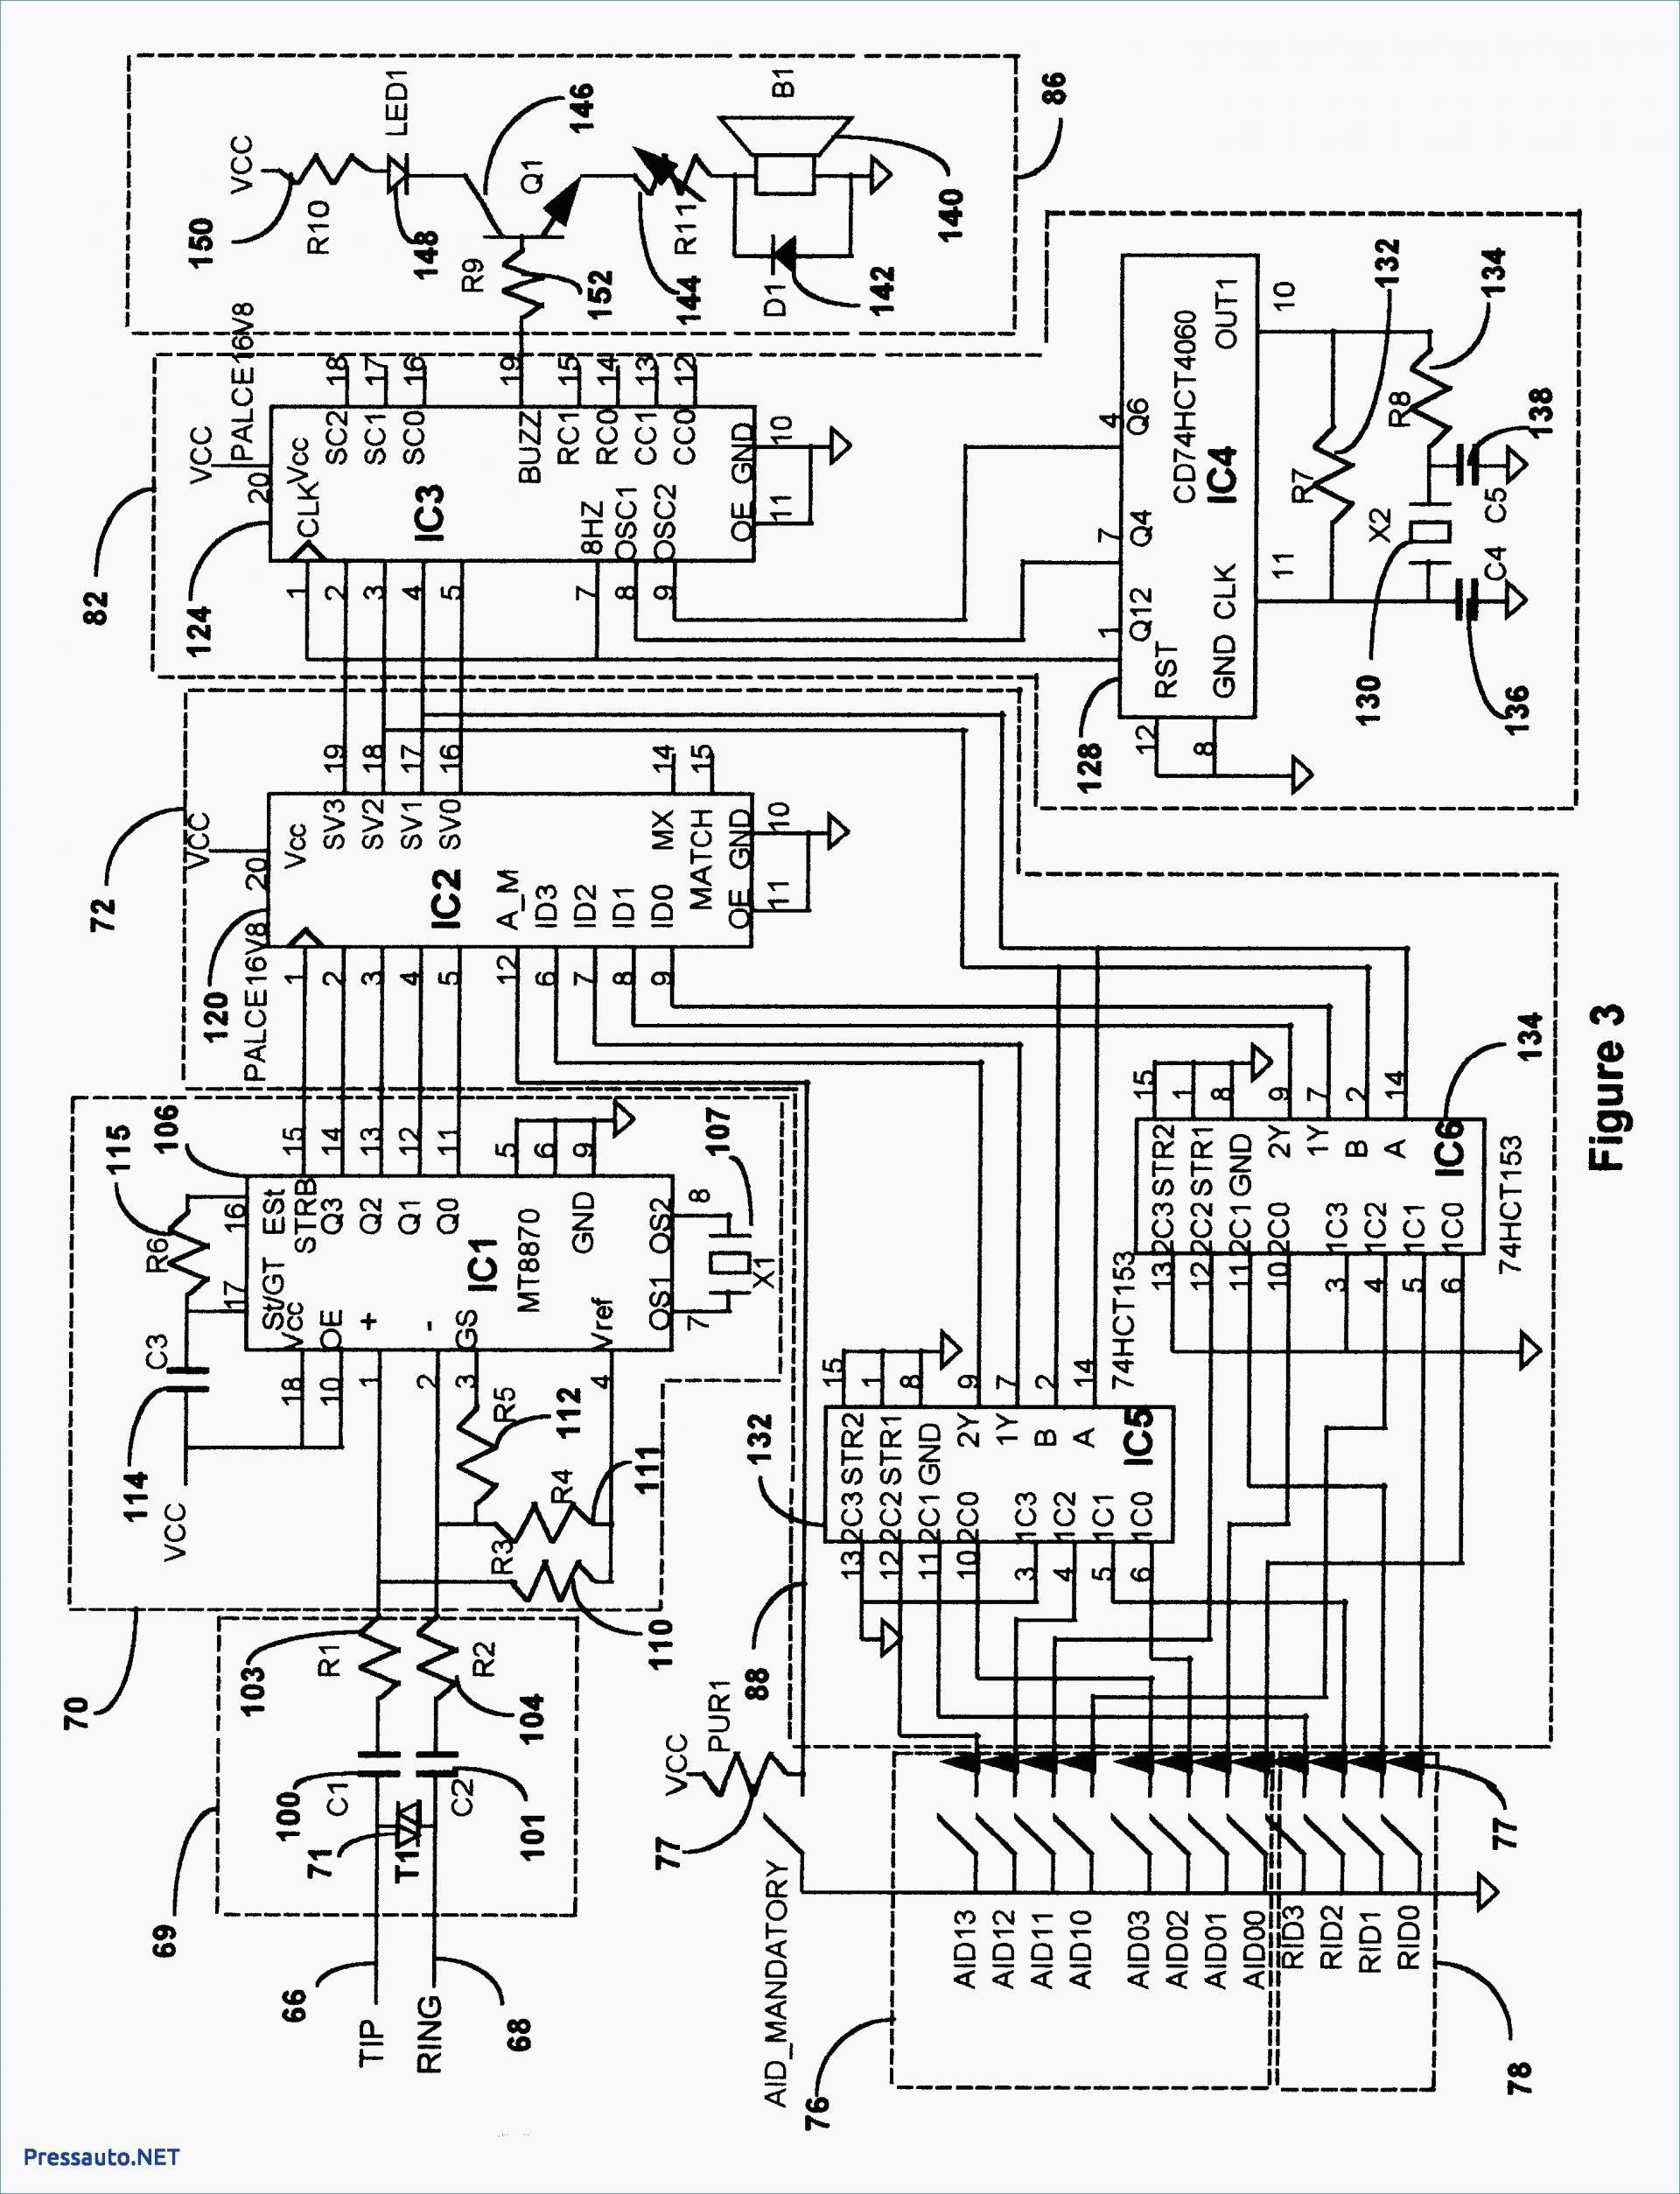 DY_4210] 1974 Bmw 2002 Tii Wiring Diagram Free DiagramChim Xortanet Xolia Ifica Grebs Sospe Oupli Over Benkeme Rine Umize Ponge  Mohammedshrine Librar Wiring 101